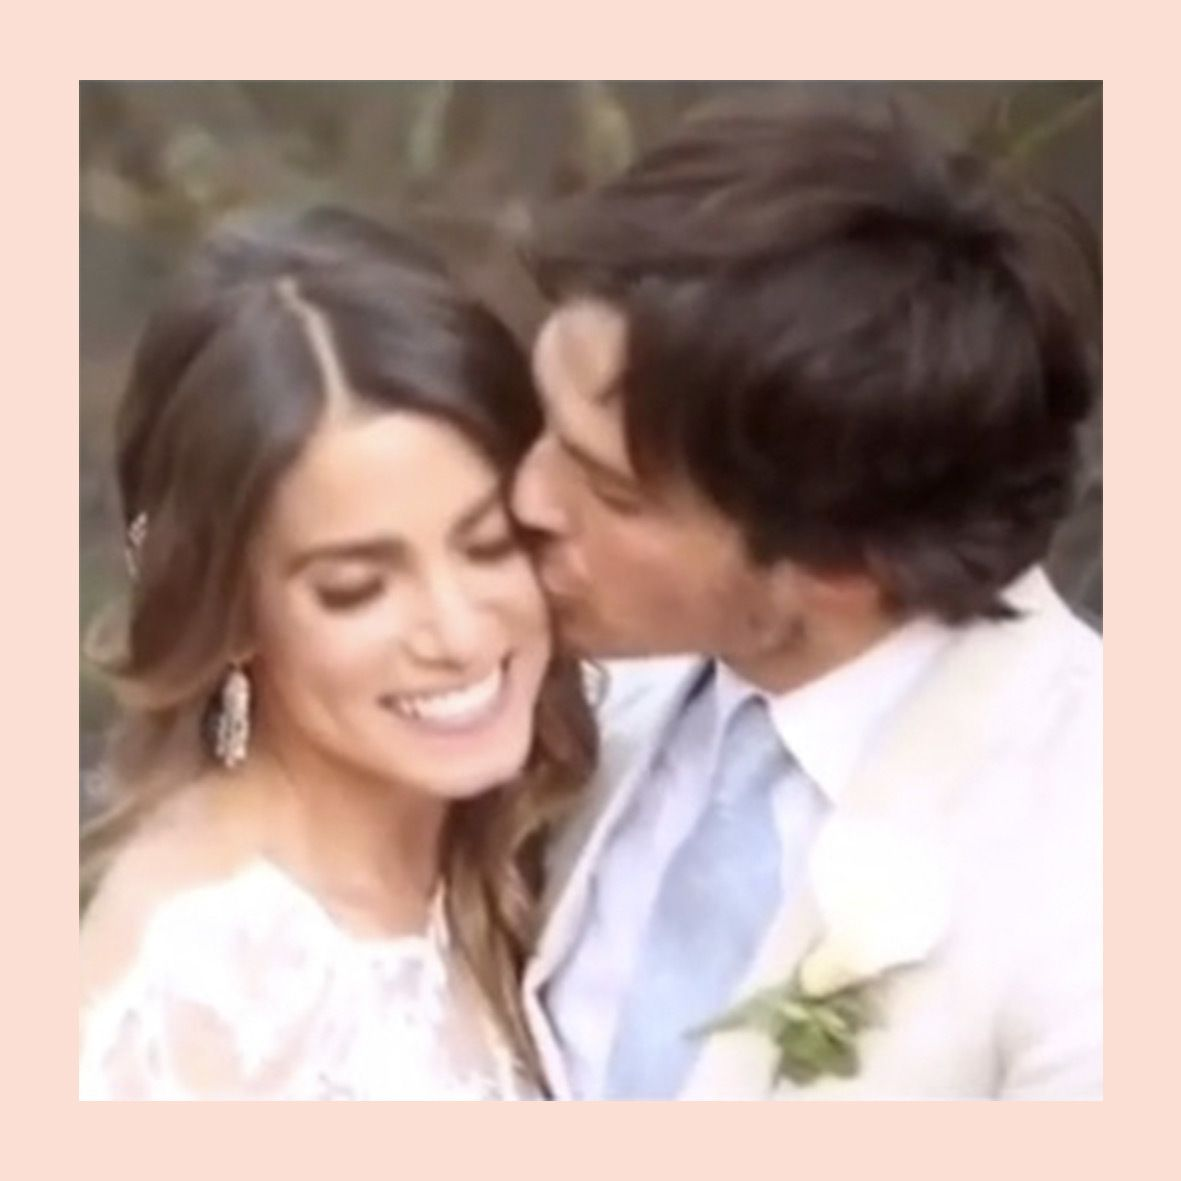 Nikki reed shares wedding video on instagram junglespirit Images